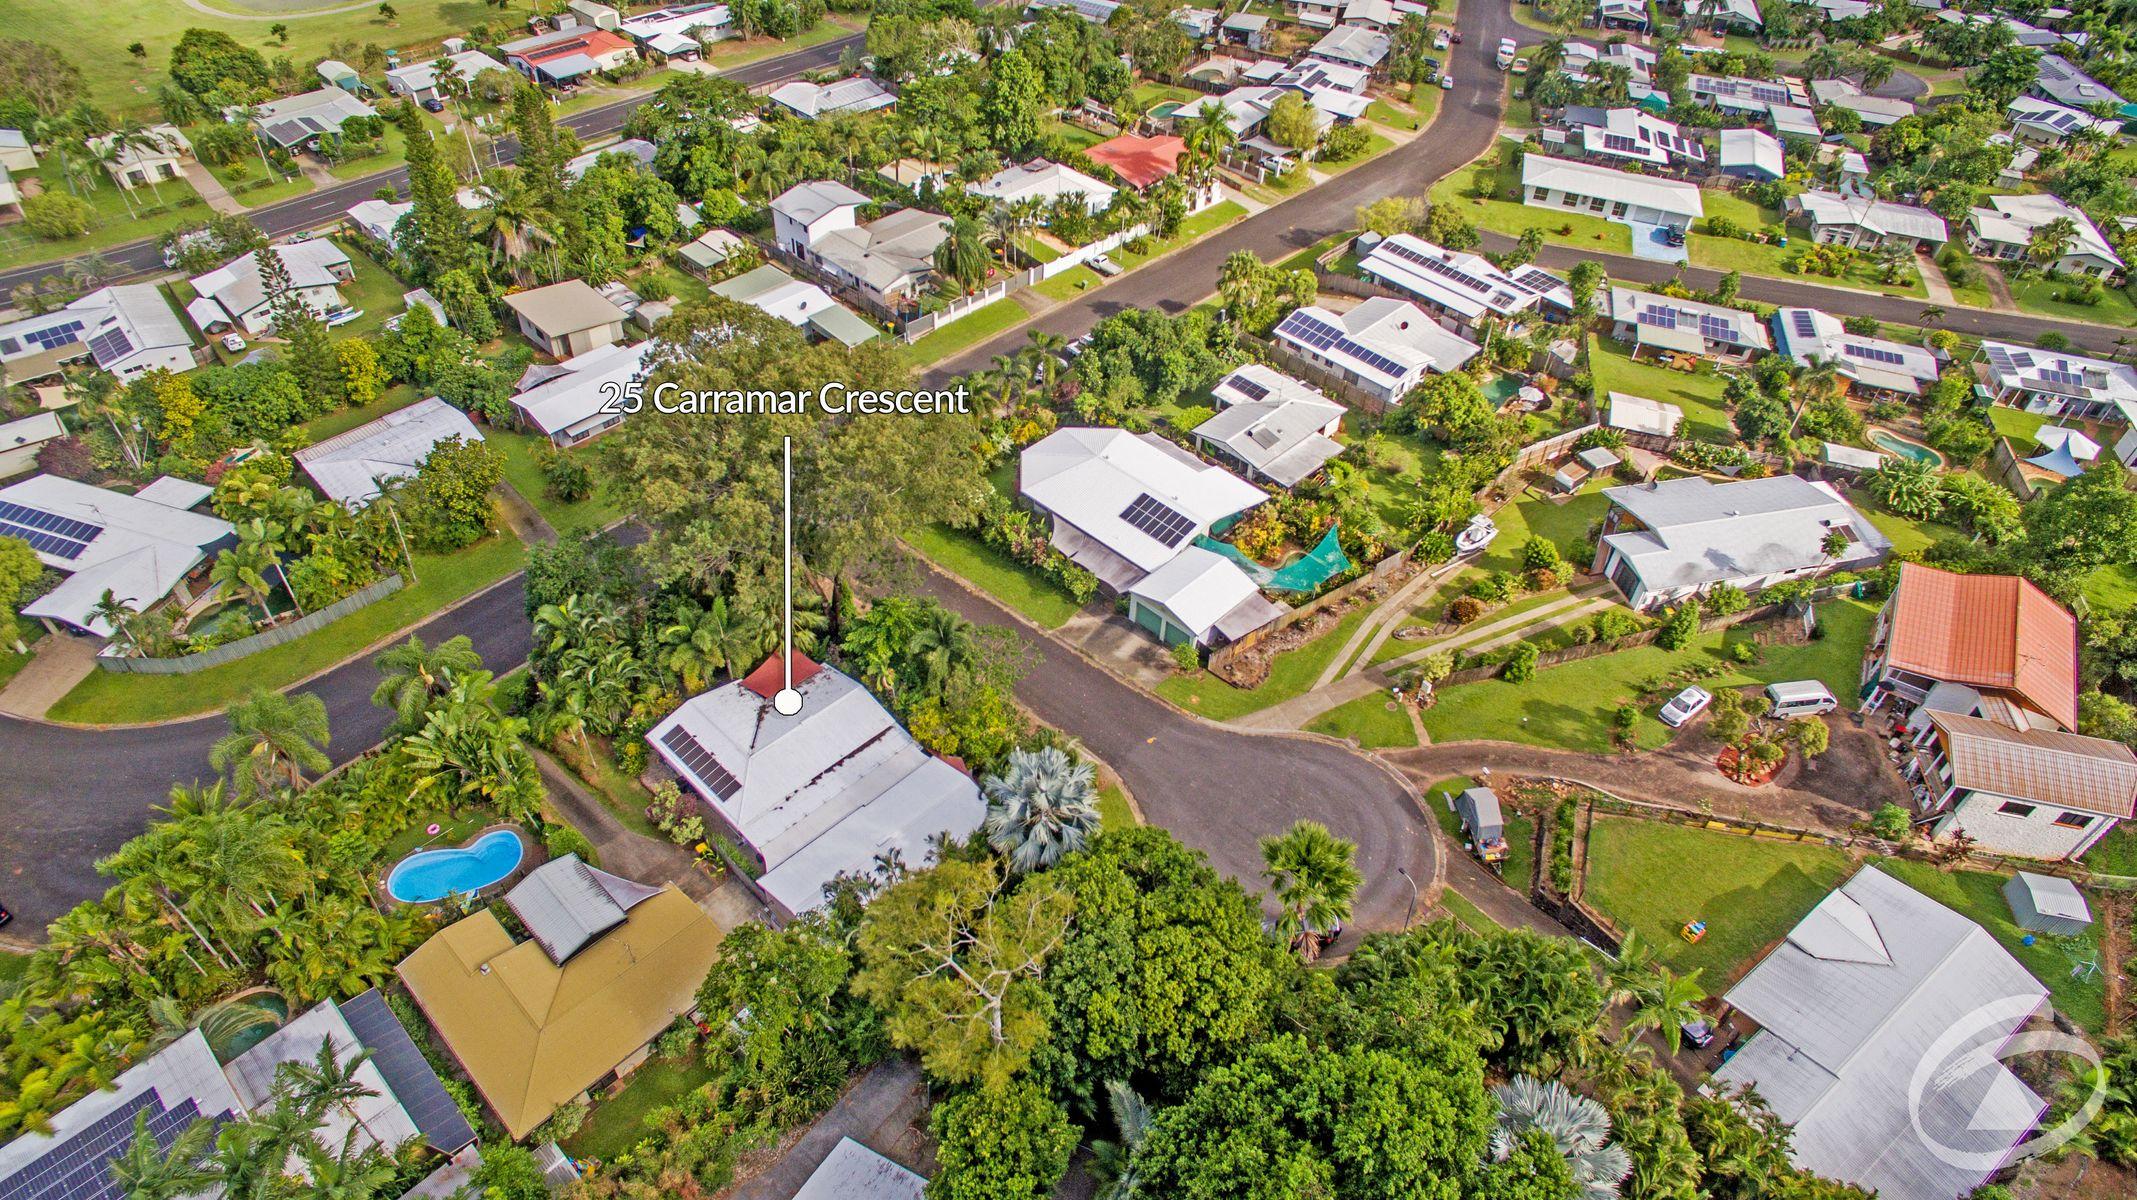 25 Carramar Crescent, Caravonica, QLD 4878